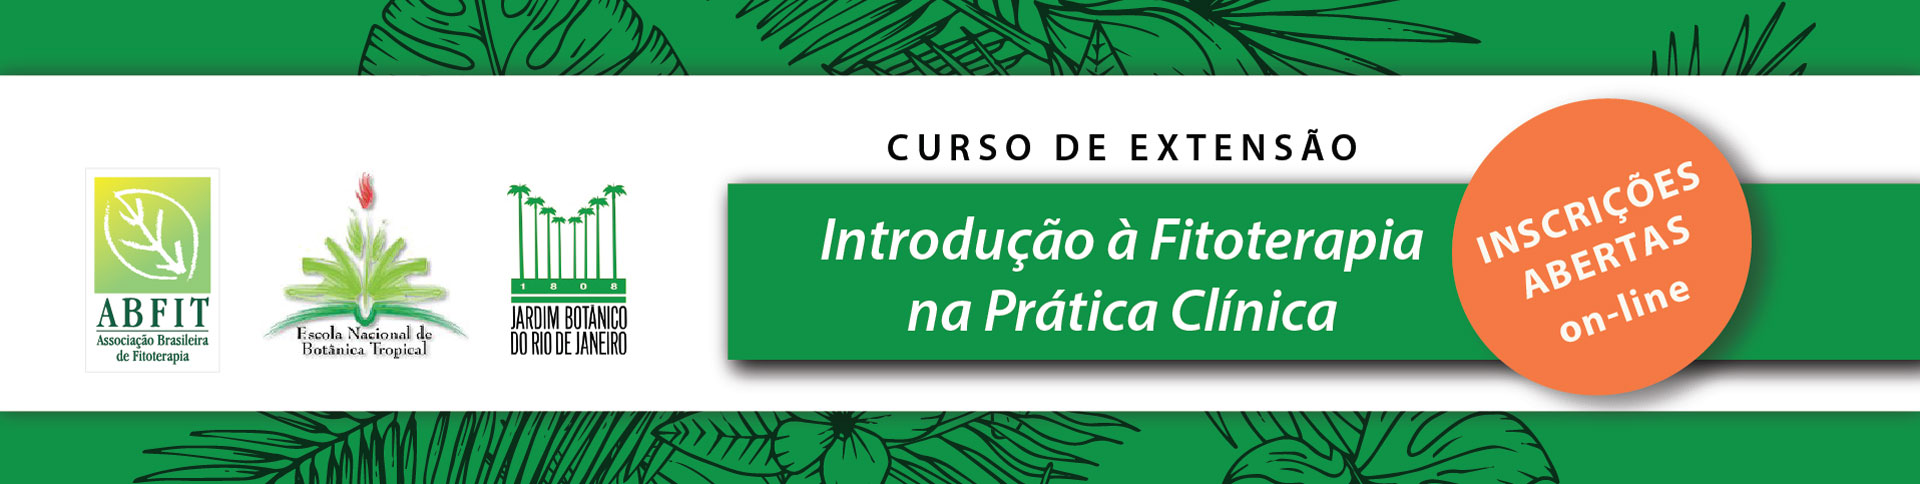 banner-1920px-curso-extensao-abfit-enbt-2020-200916.jpg